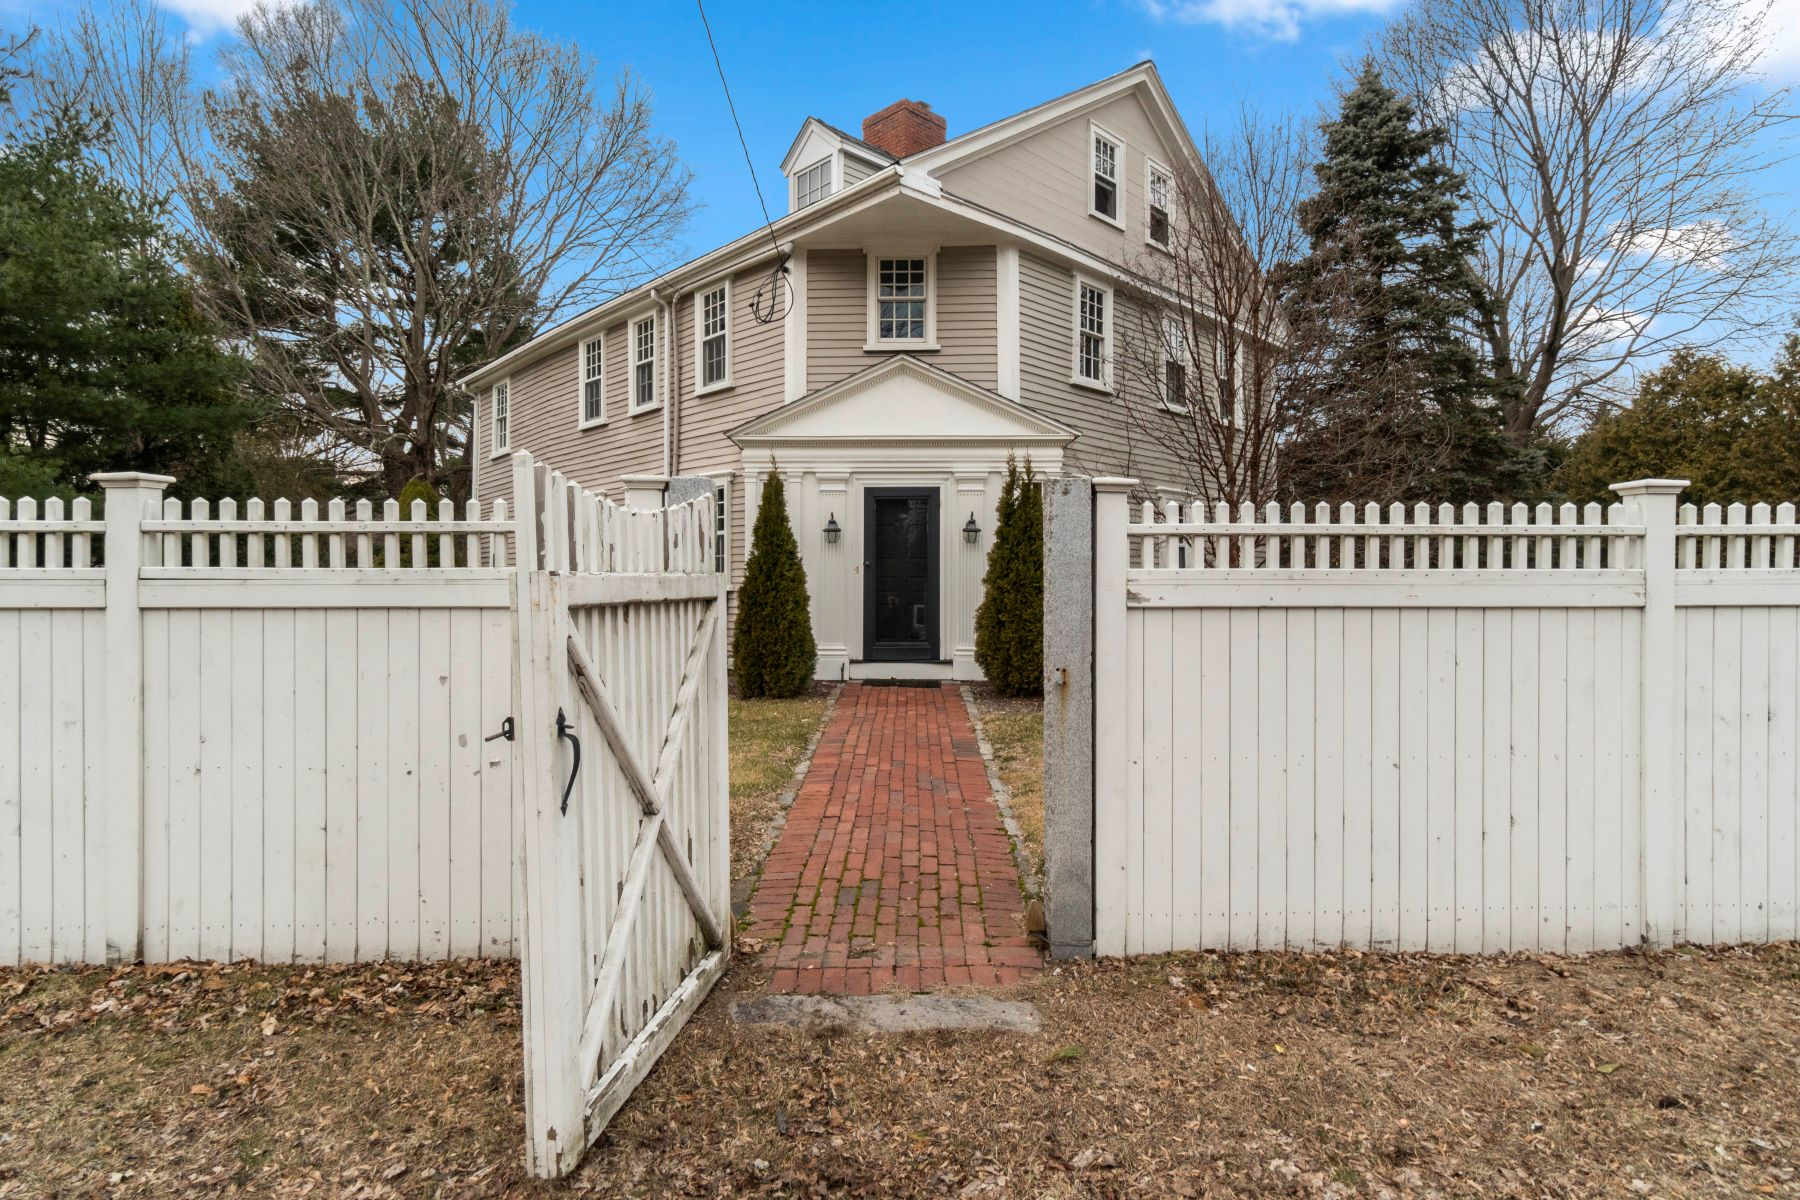 Single Family Homes 为 销售 在 927 High St., Dedham 927 High Street 戴德姆, 马萨诸塞州 02026 美国